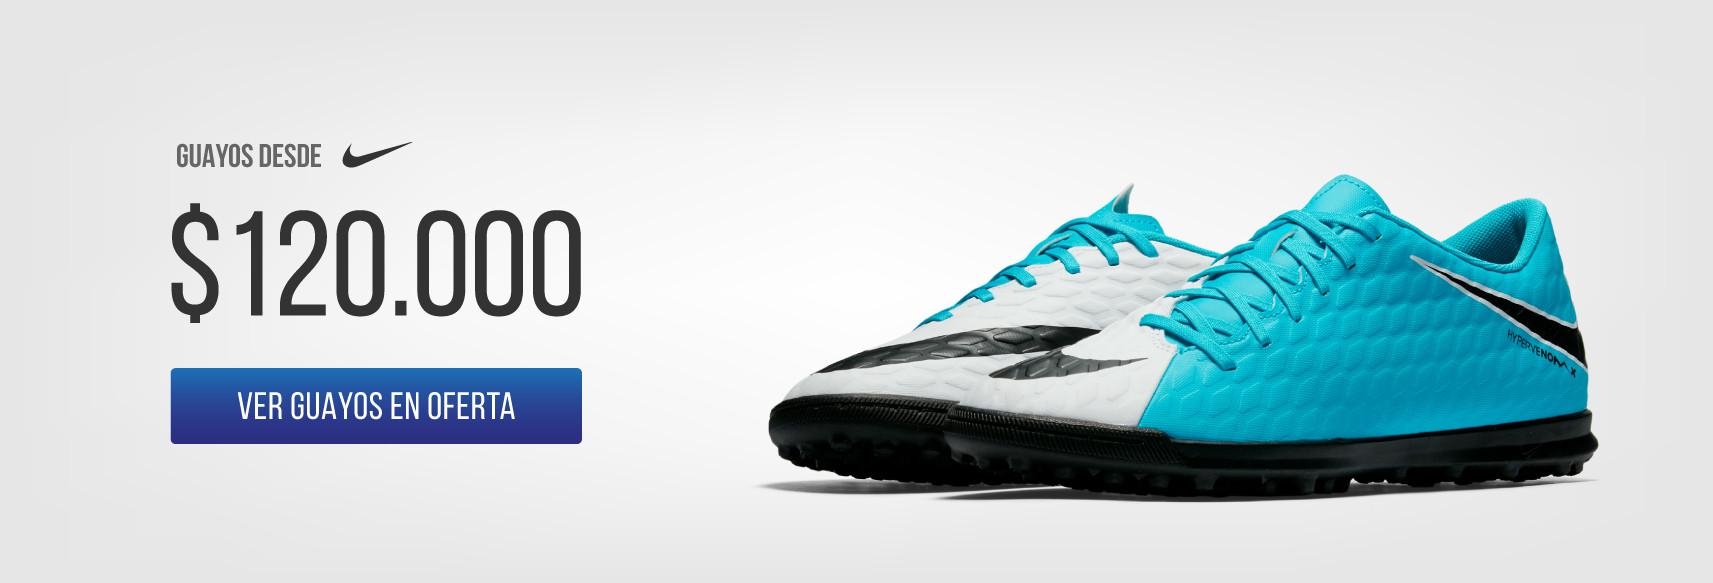 93099b33eeefb https   www.azzurry.com categoria-hombre-calzado